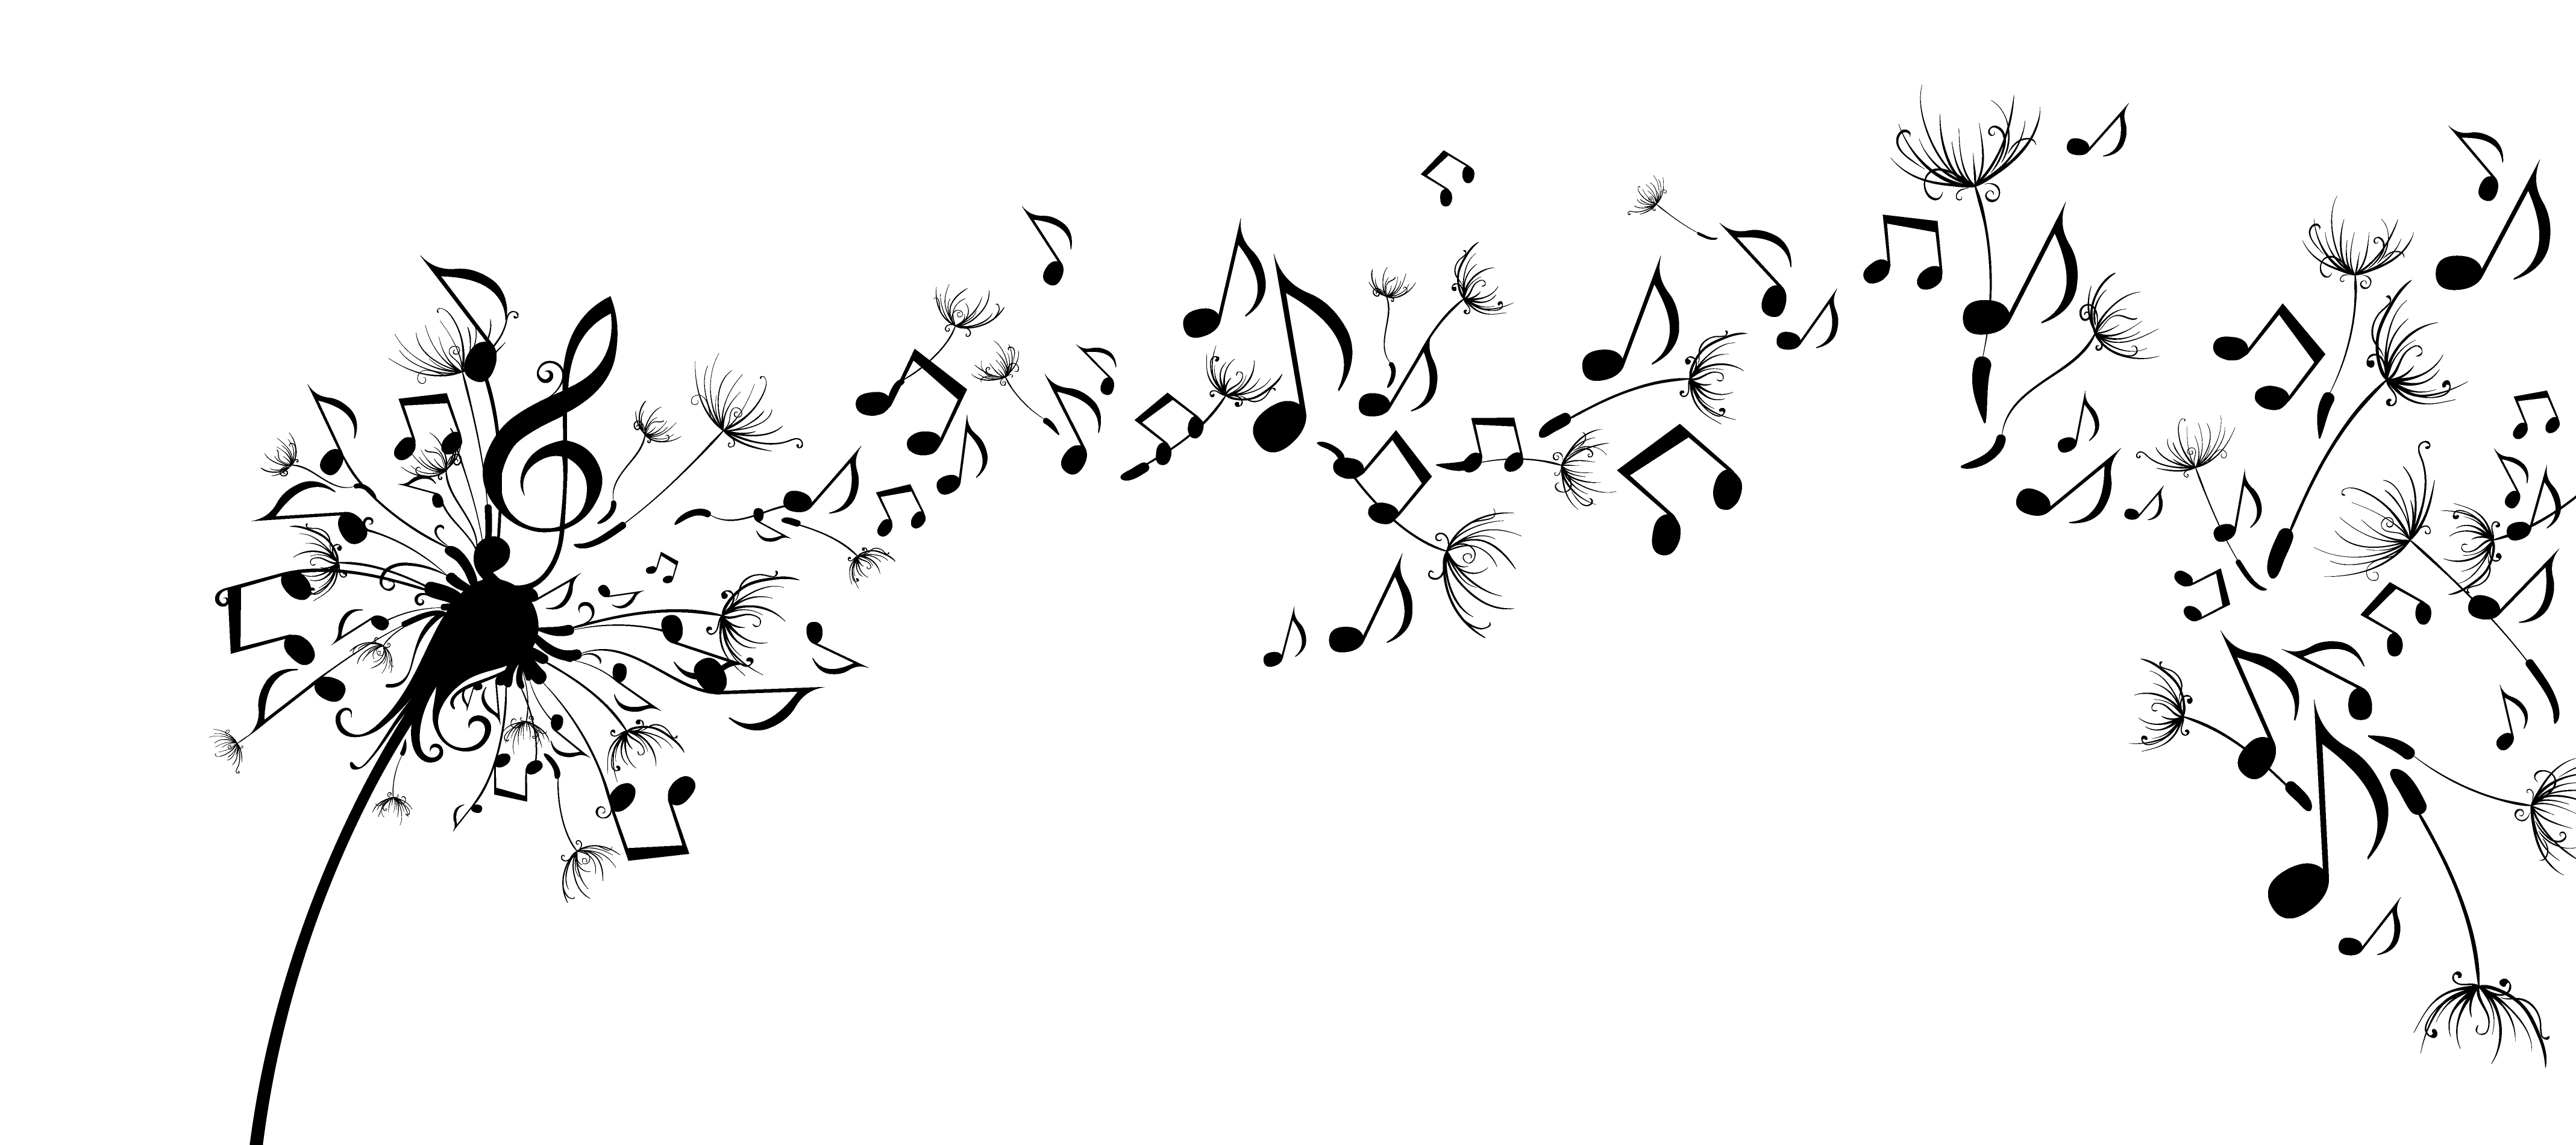 music-dandelion